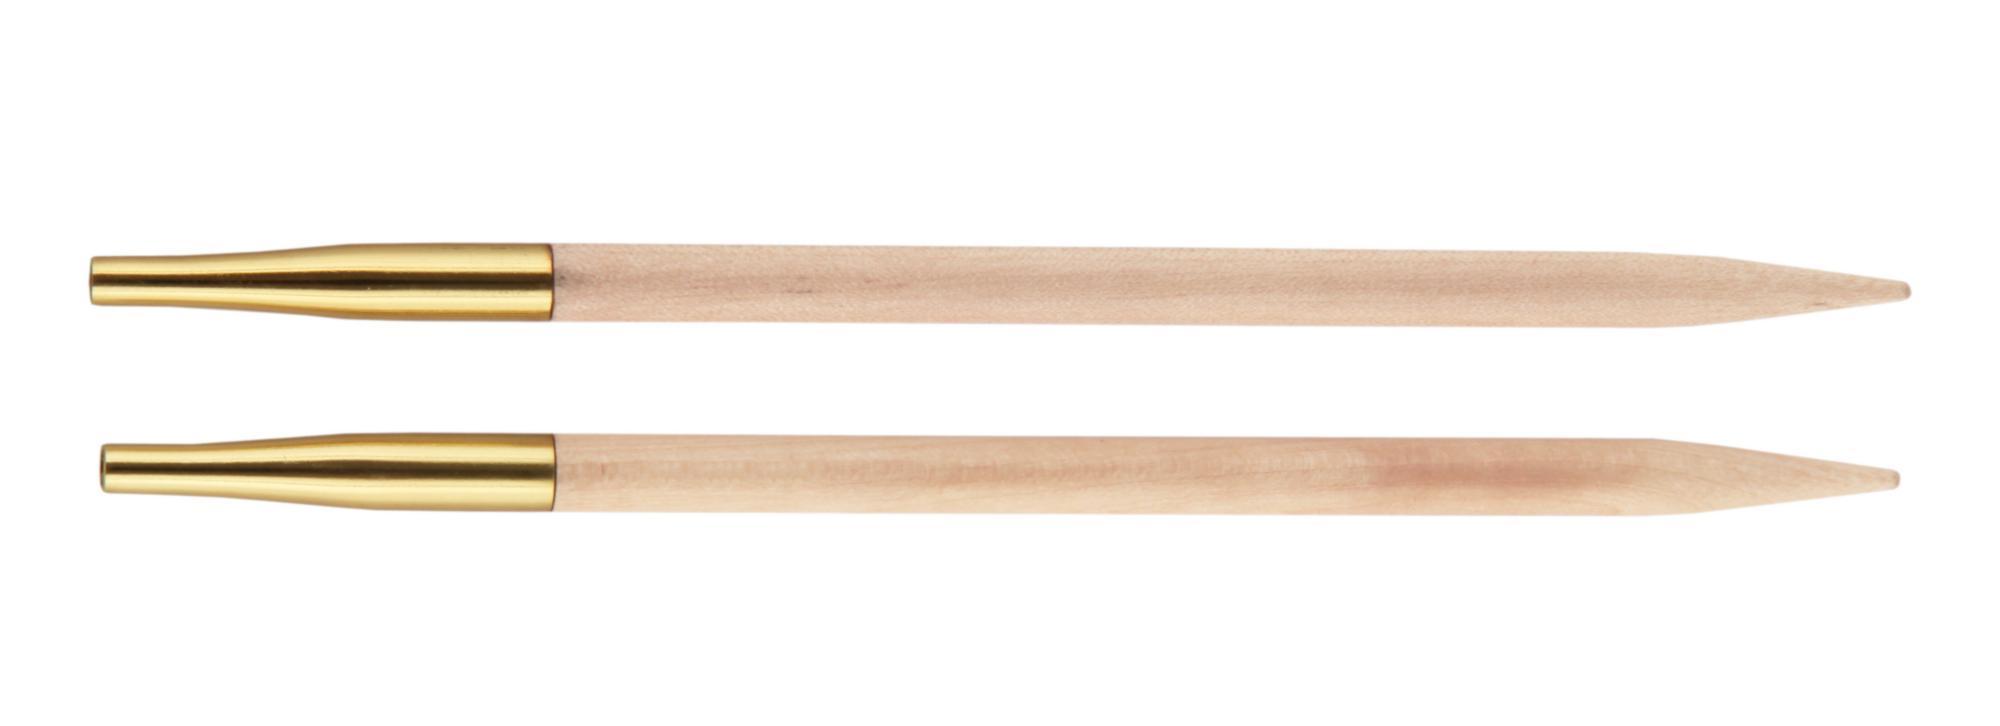 Спицы съемные короткие Basix Birch Wood KnitPro, 35655, 4.00 мм